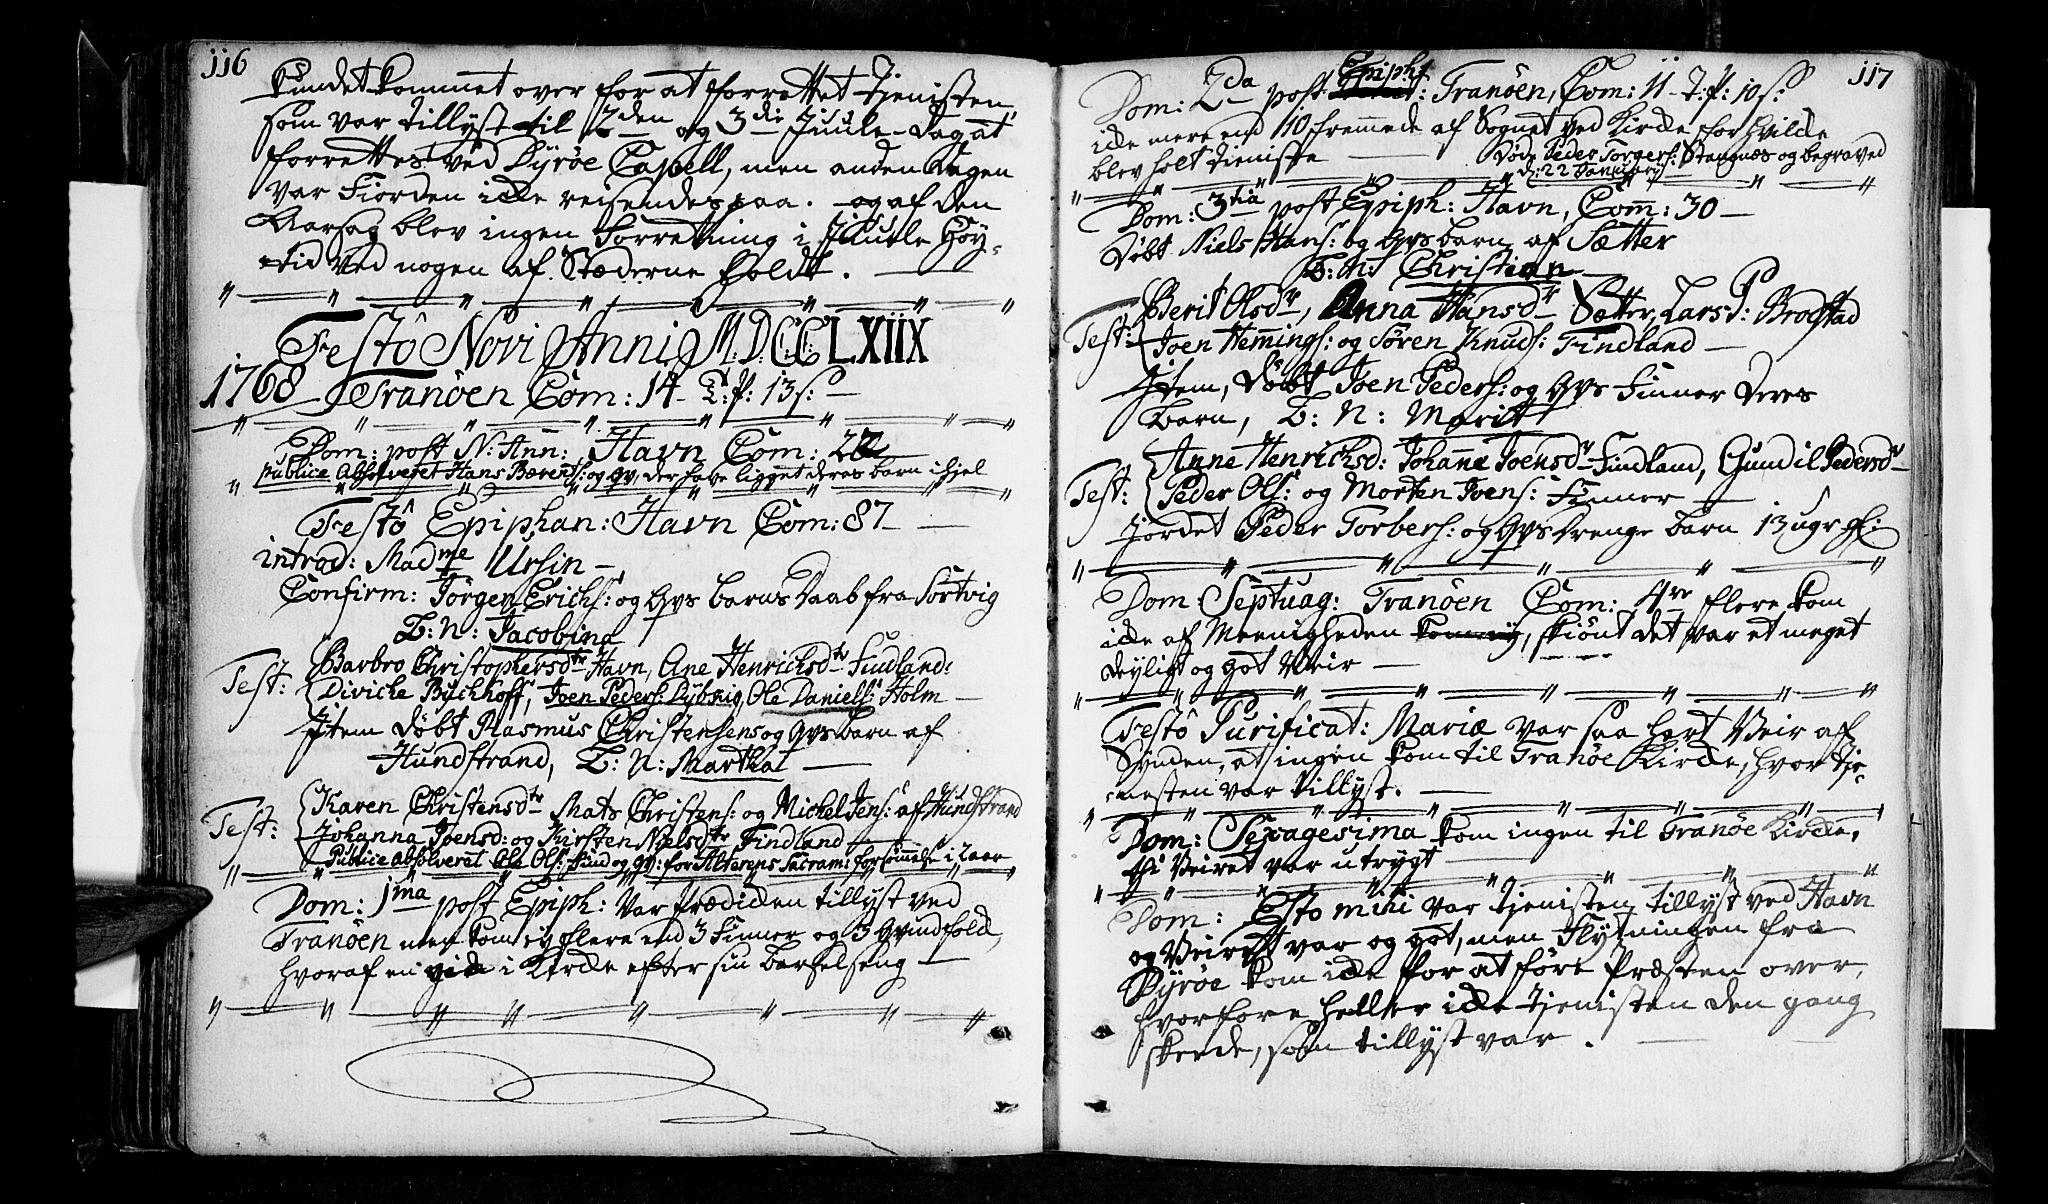 SATØ, Tranøy sokneprestkontor, I/Ia/Iaa/L0001kirke: Ministerialbok nr. 1, 1757-1773, s. 116-117